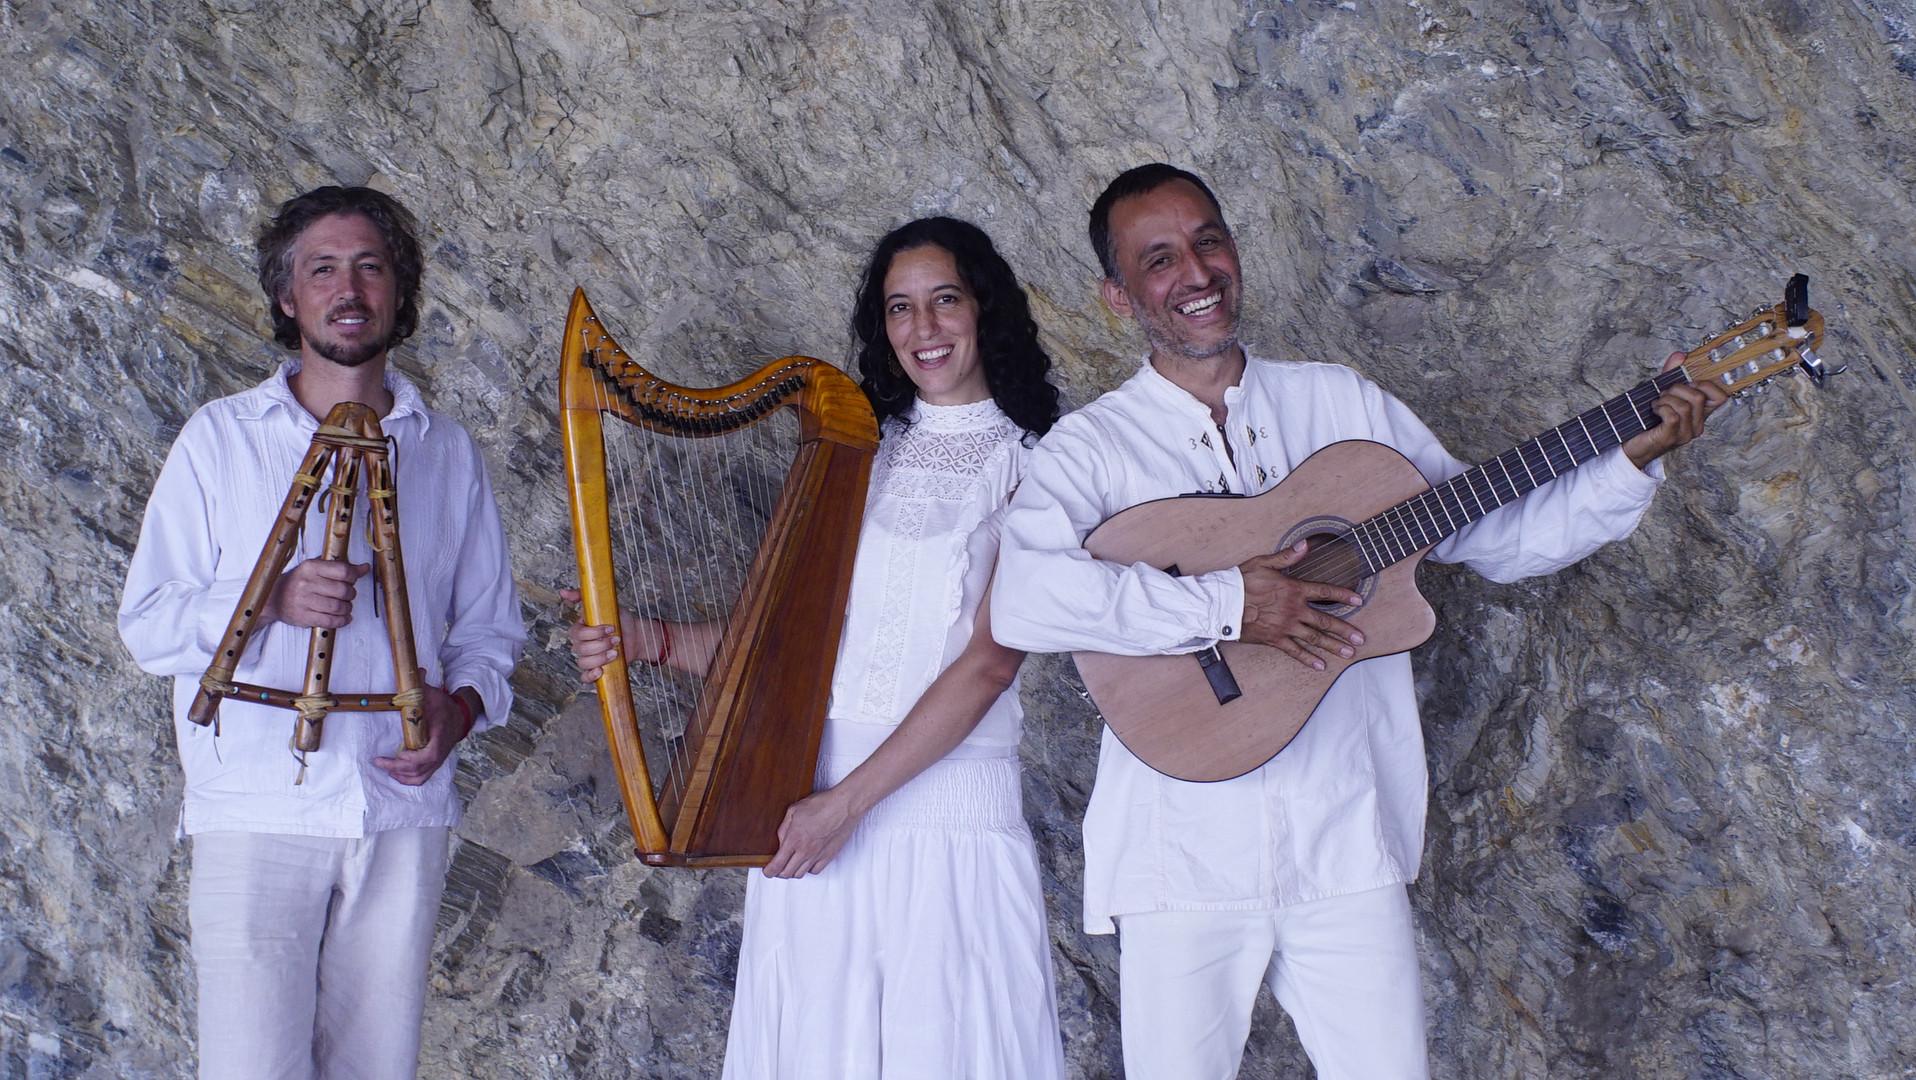 Osiris Heyerdhal, Gabriela Rosales y Rodrigo D. Perez Vega